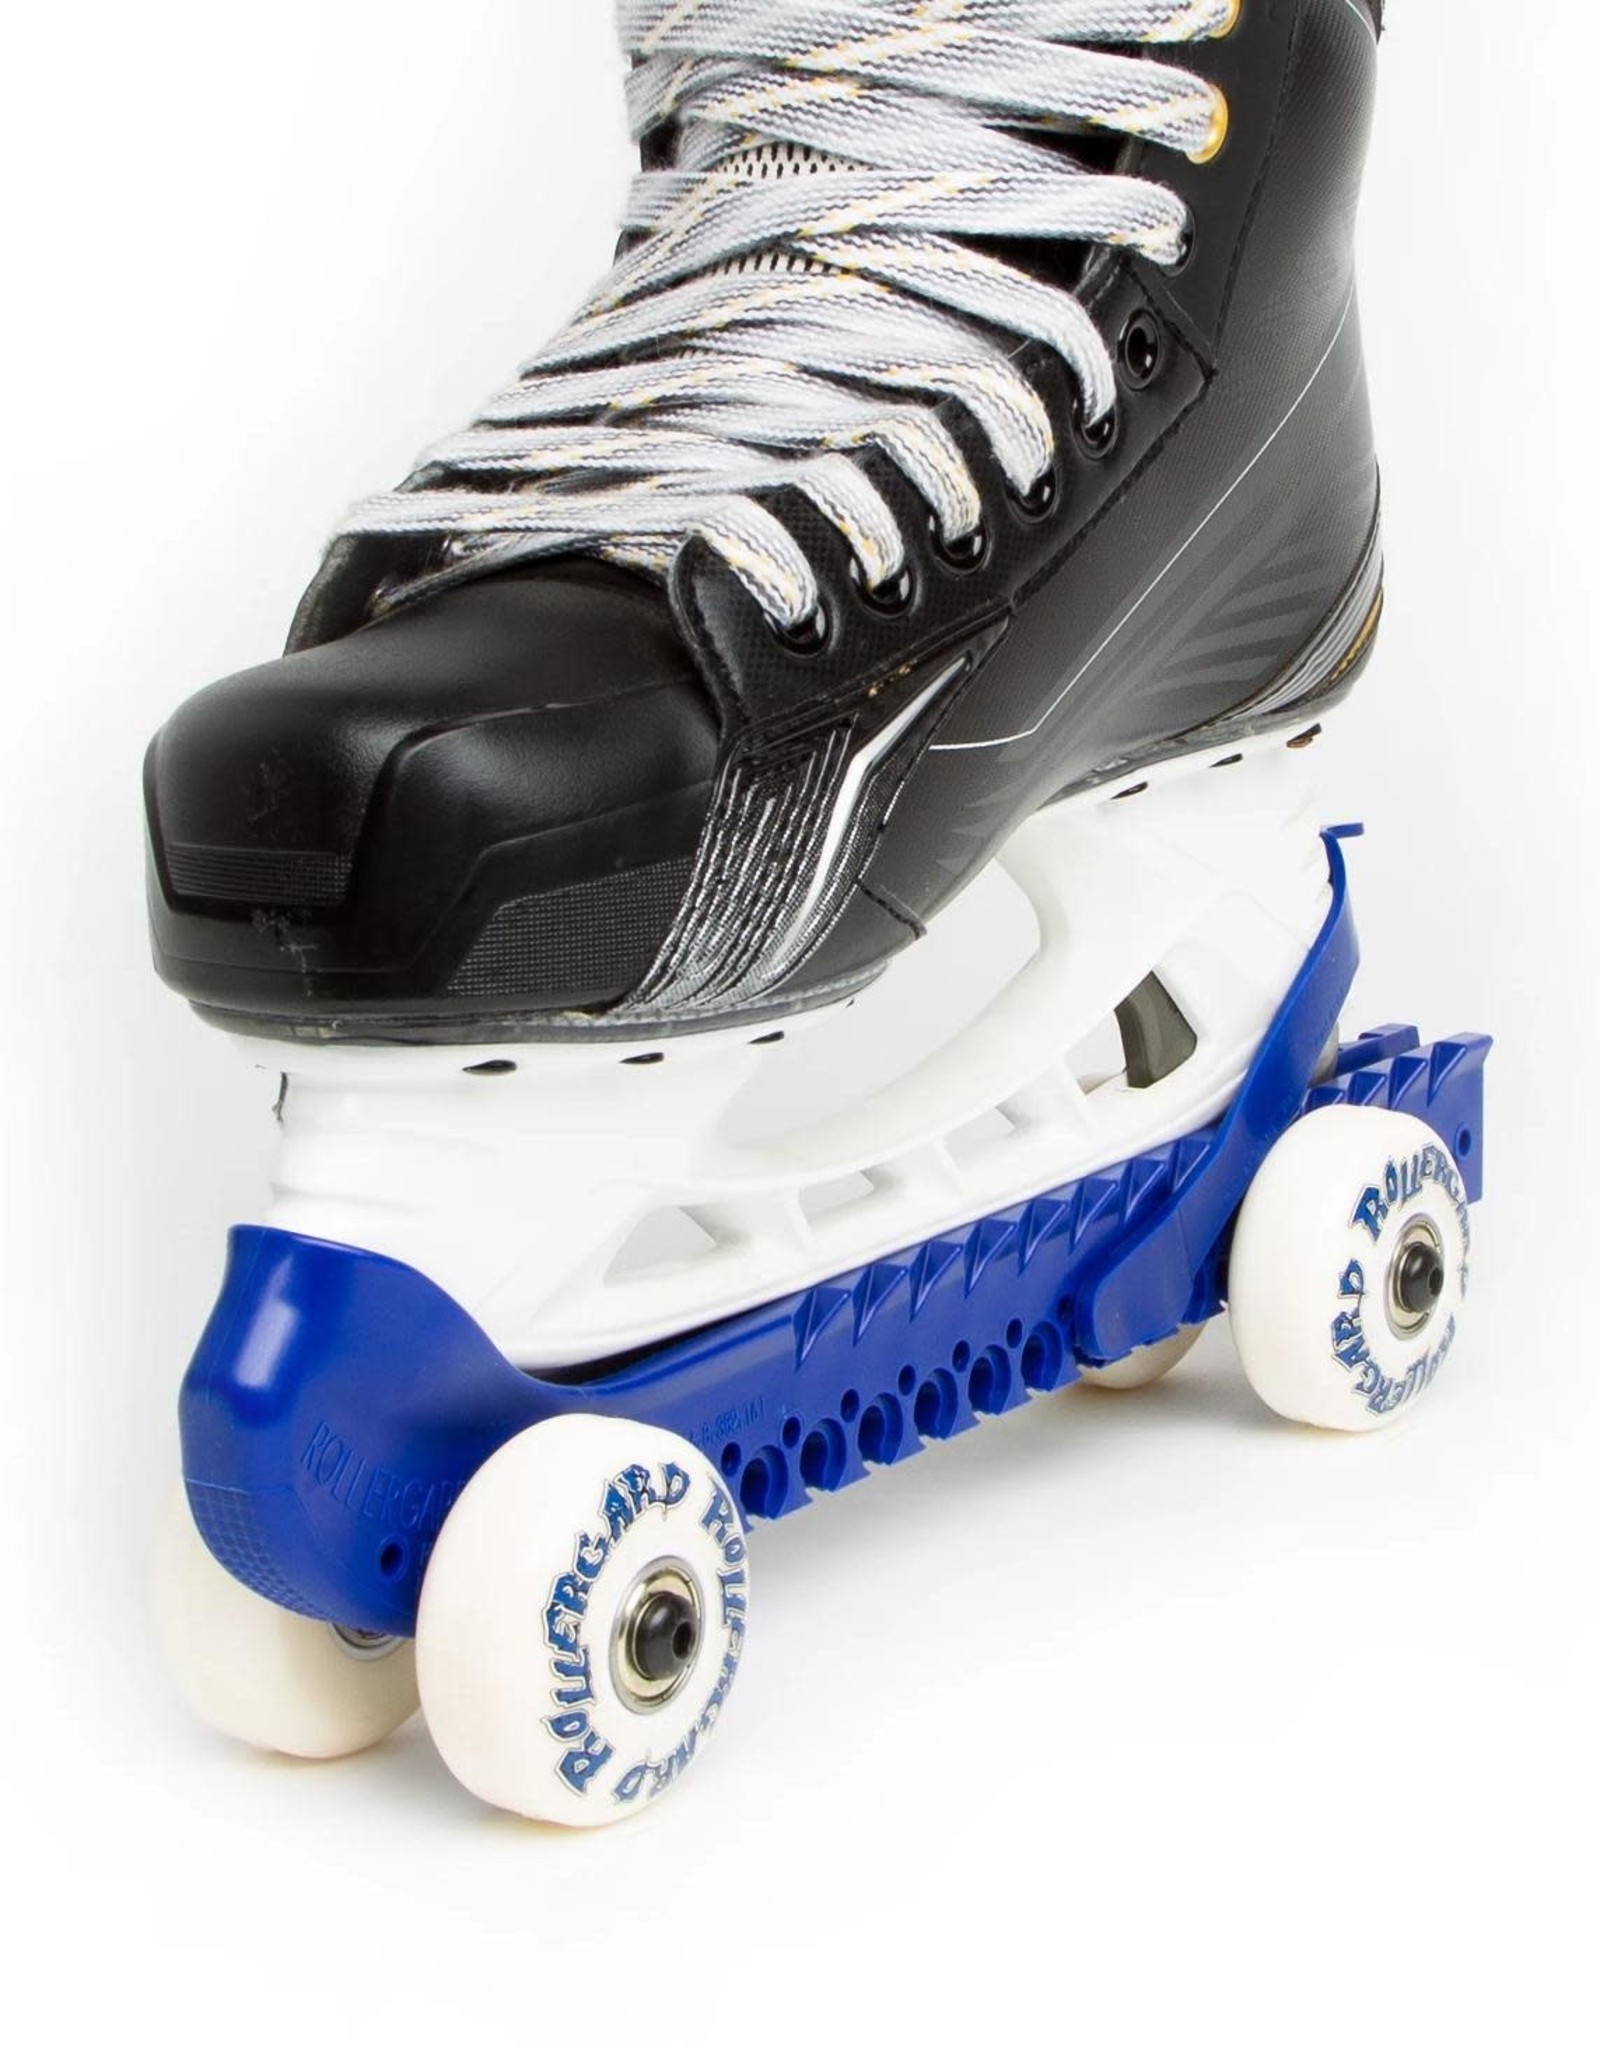 Rollergard Rollergard Rolling Skate Guard (BLUE)